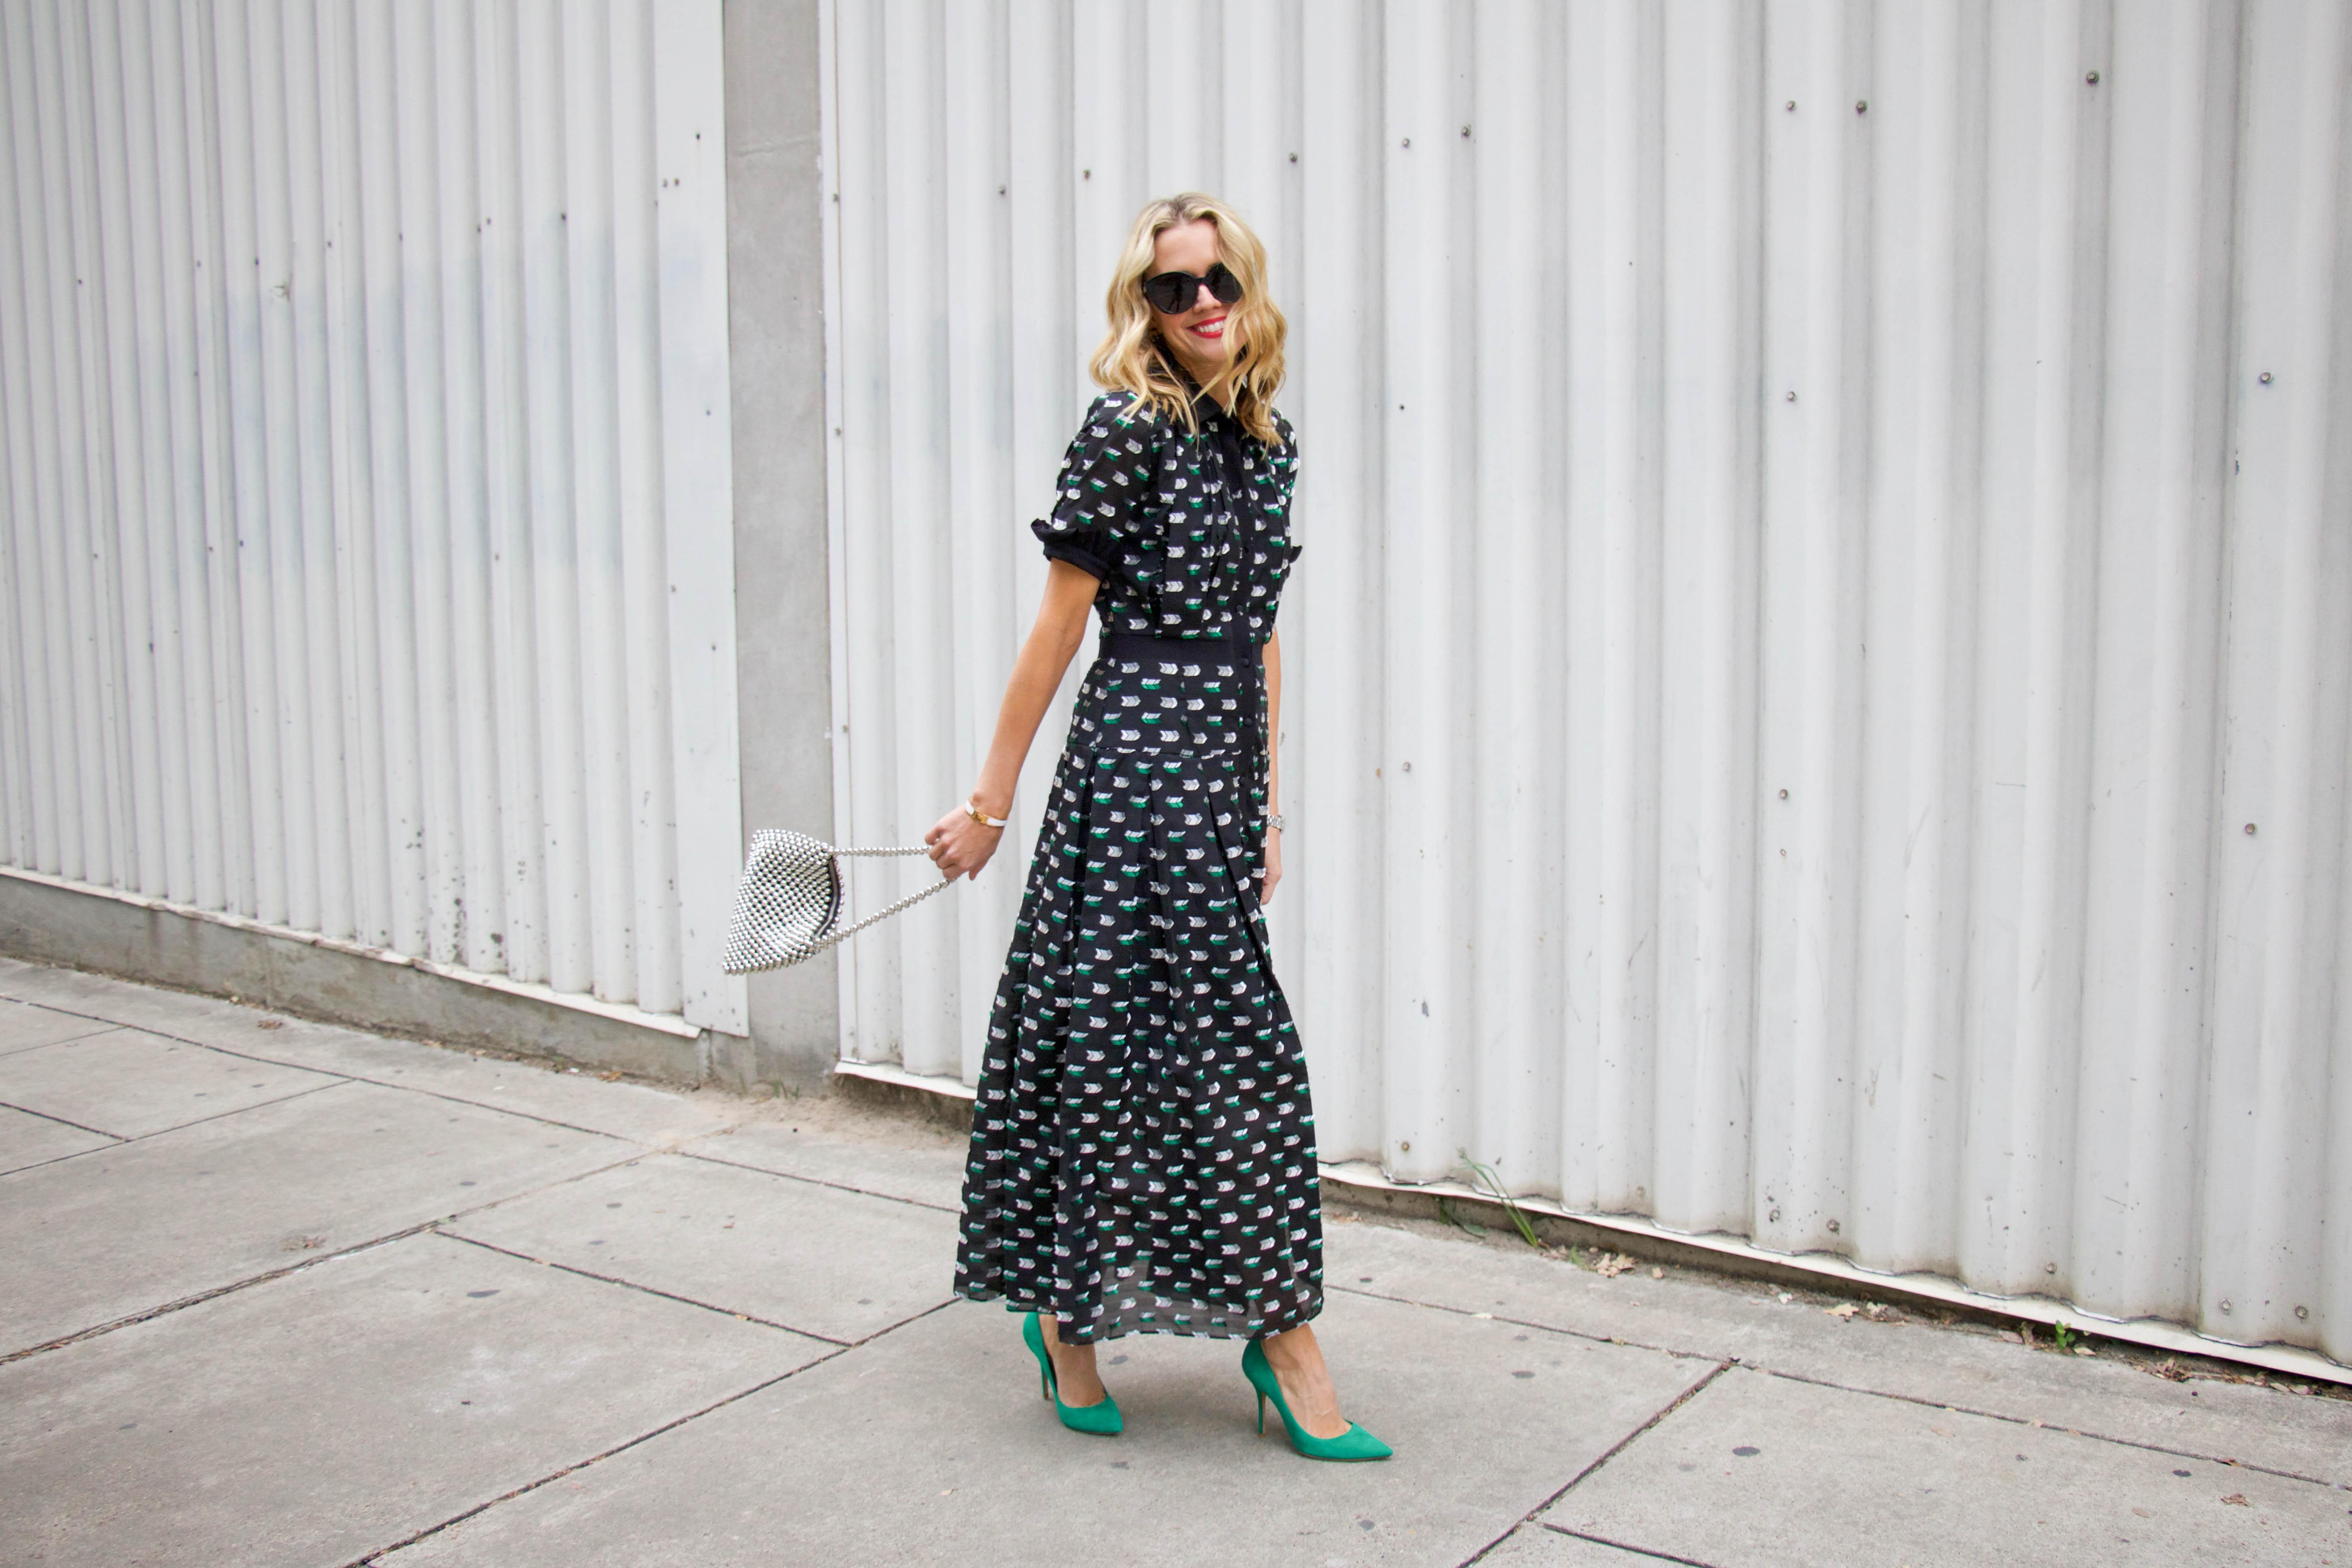 Hunter Bell NYC holiday party maxi dress - Topshop bag - Green pumps